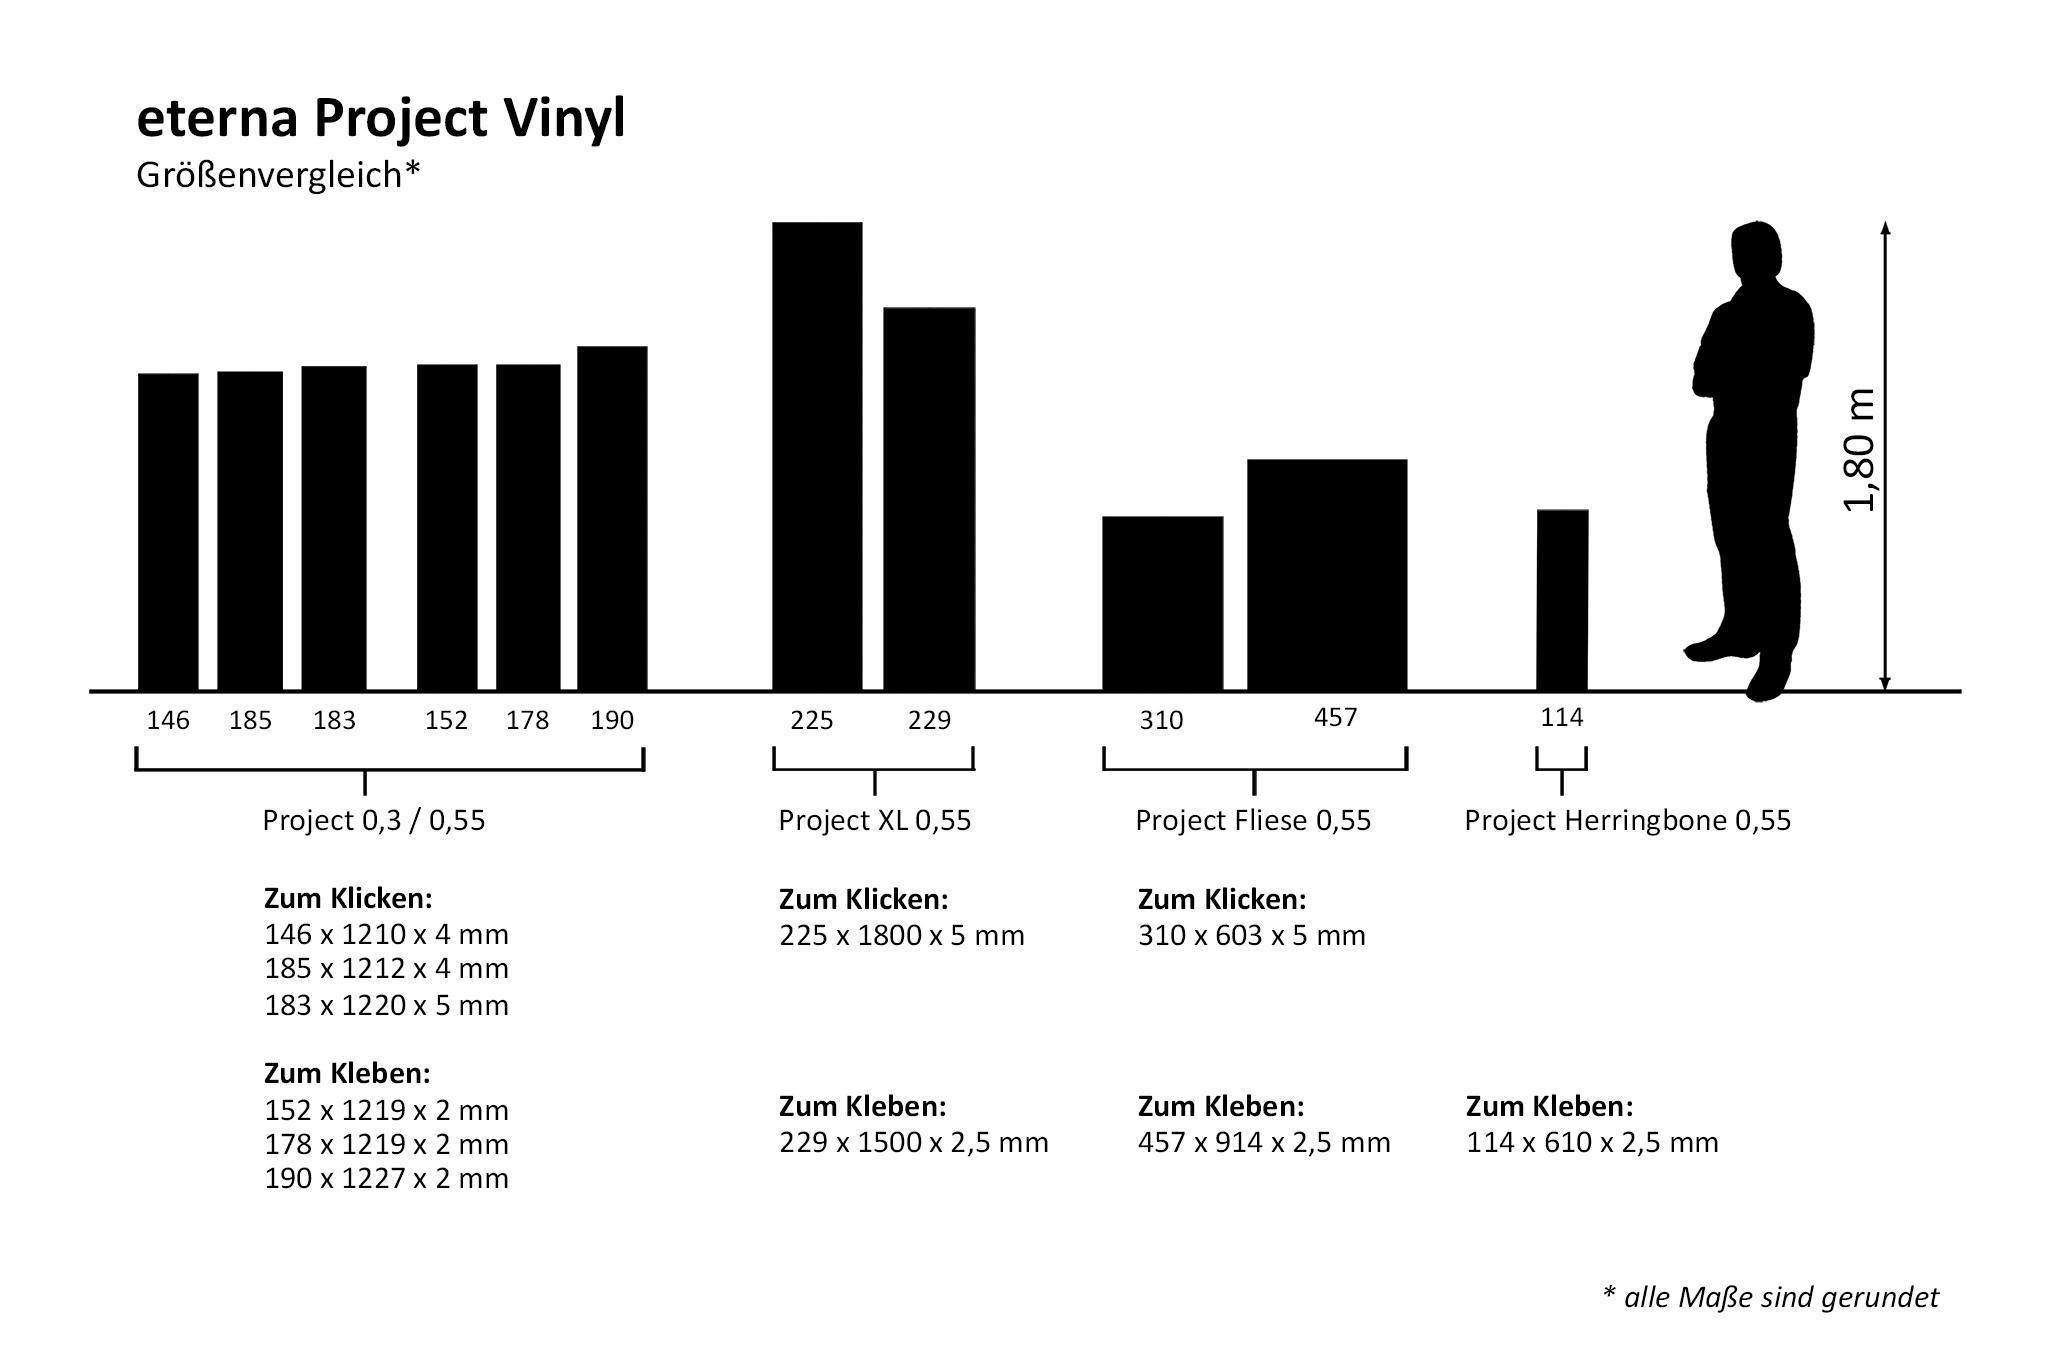 eterna Project Vinyl Vintage Pine 0,33